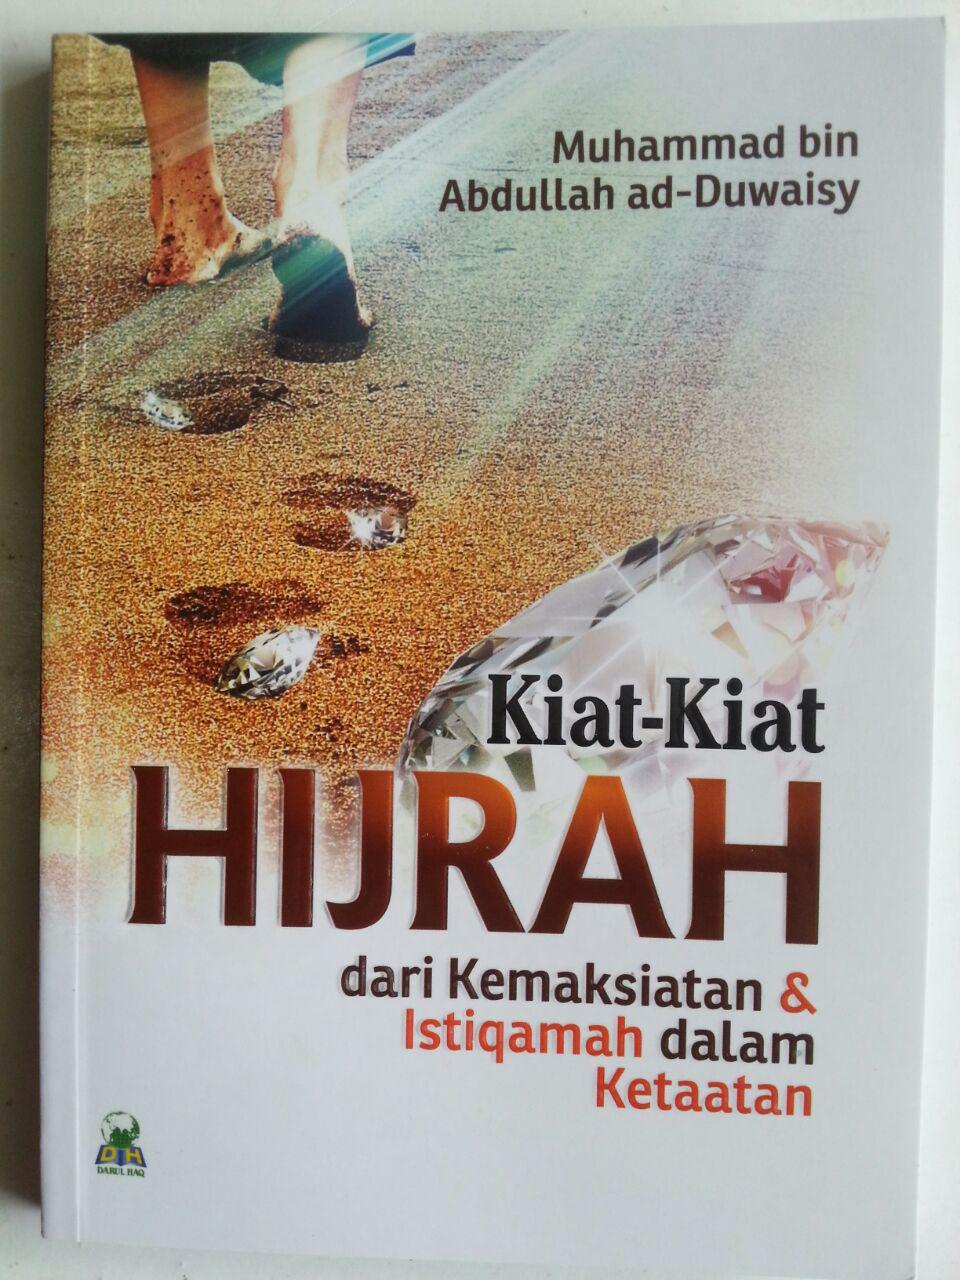 Buku Kiat-Kiat Hijrah Dari Kemaksiatan Kemudian Istiqomah Dalam Ketaatan cover 2